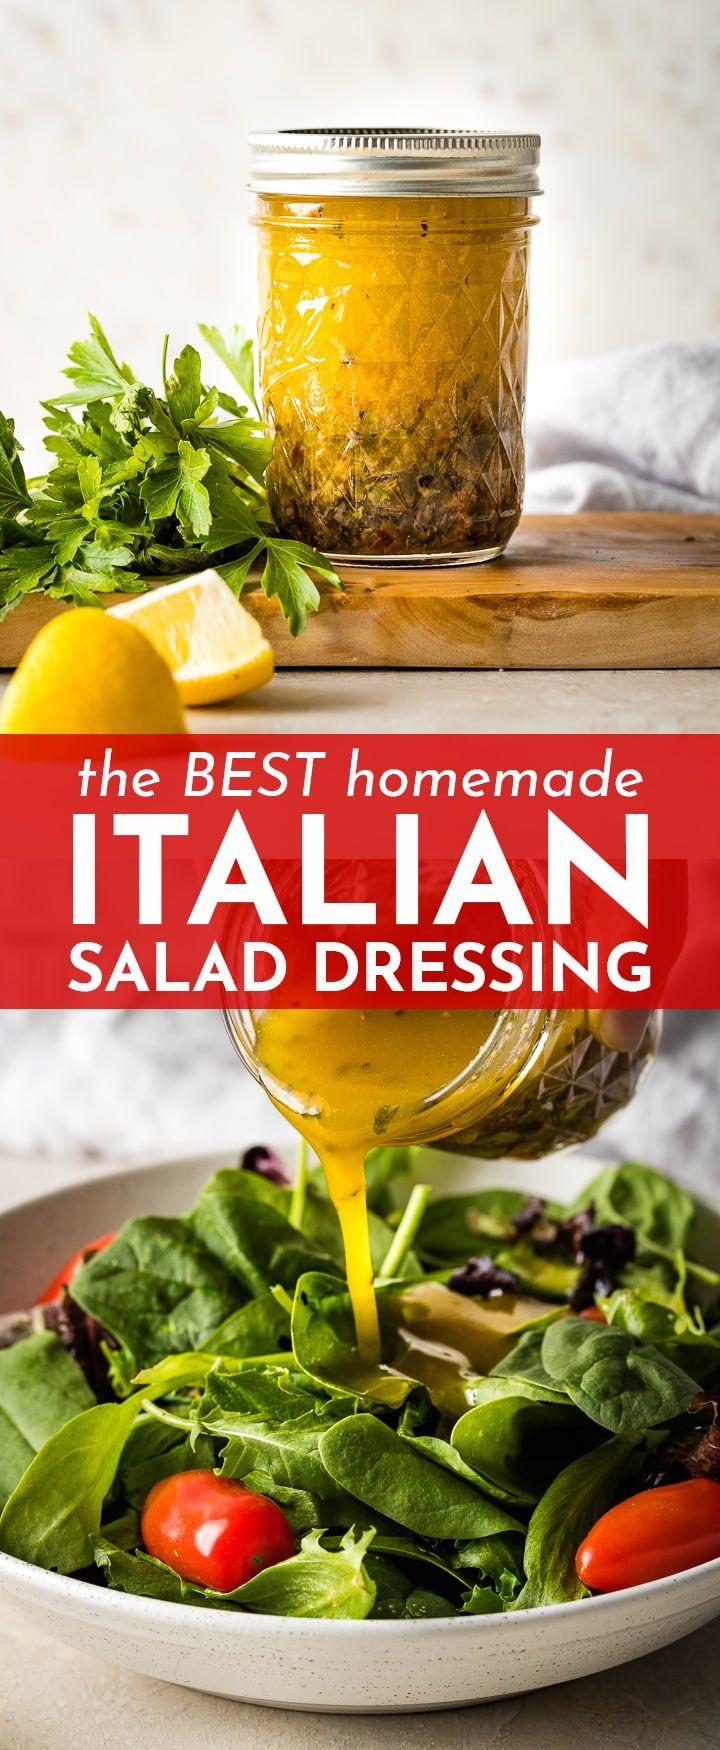 The Best Homemade Italian Salad Dressing Recipe Italian Salad Dressing Homemade Italian Salad Salad Dressing Recipes Homemade